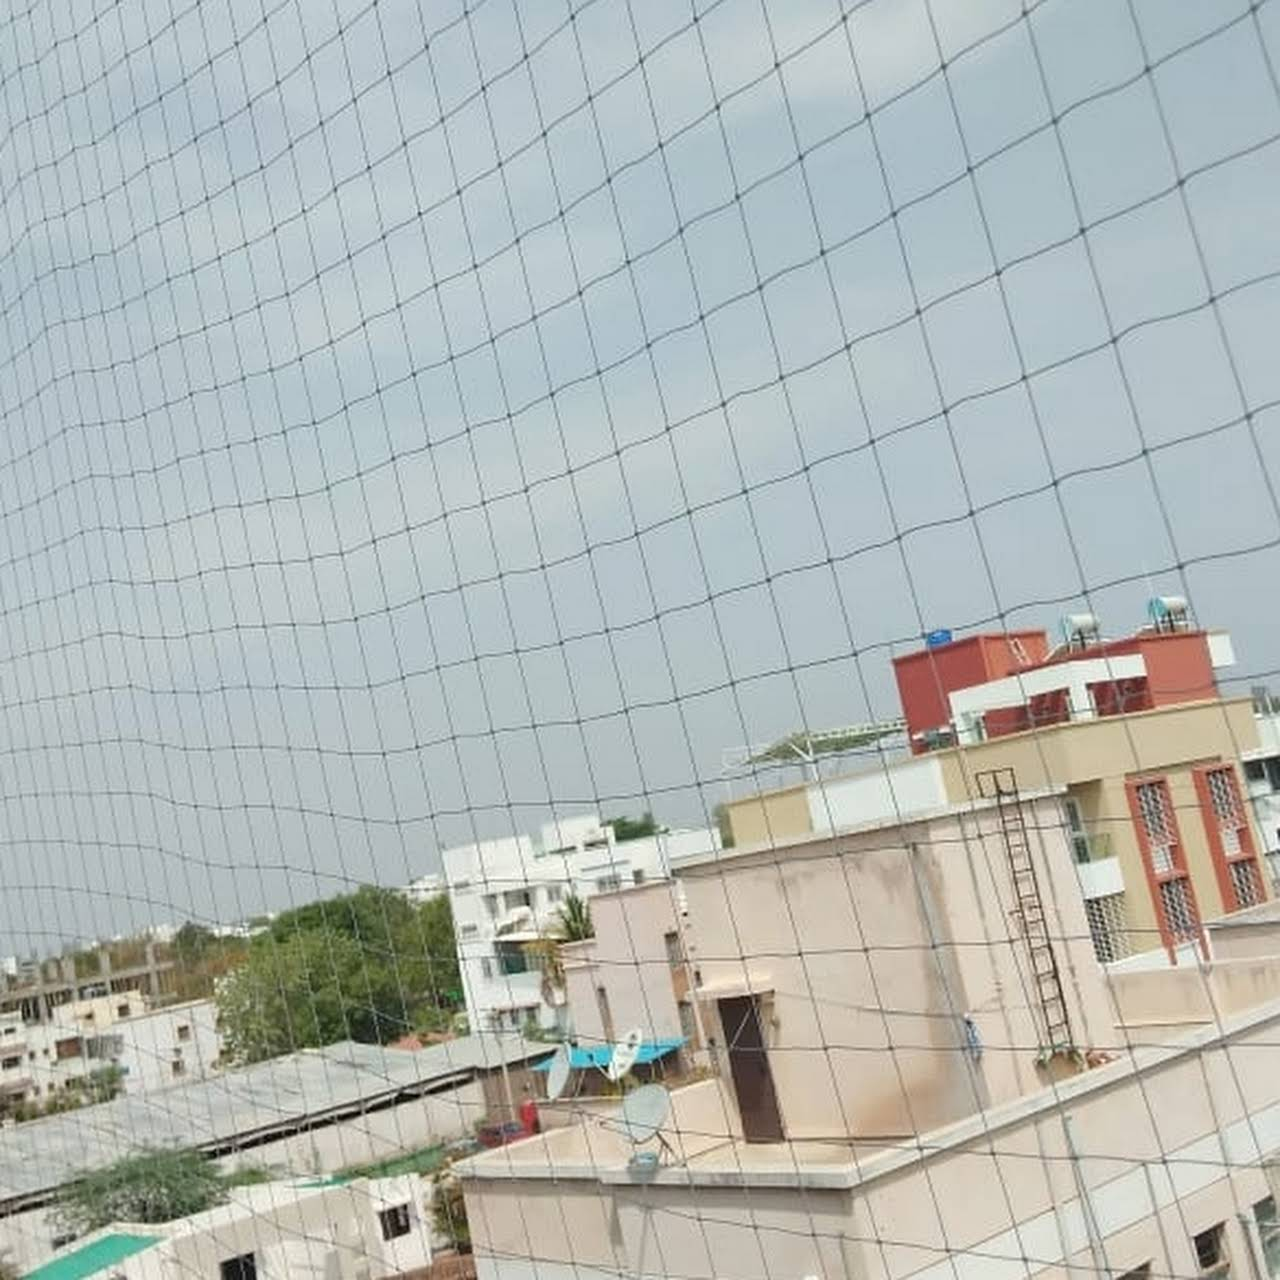 Executive Bird Netting Services, bird netting in lonavala, bird netting services in lonavala, bird control in lonavala, bird control services in lonavala, bird control services in khandala, bird netting services in khandala,best,top.